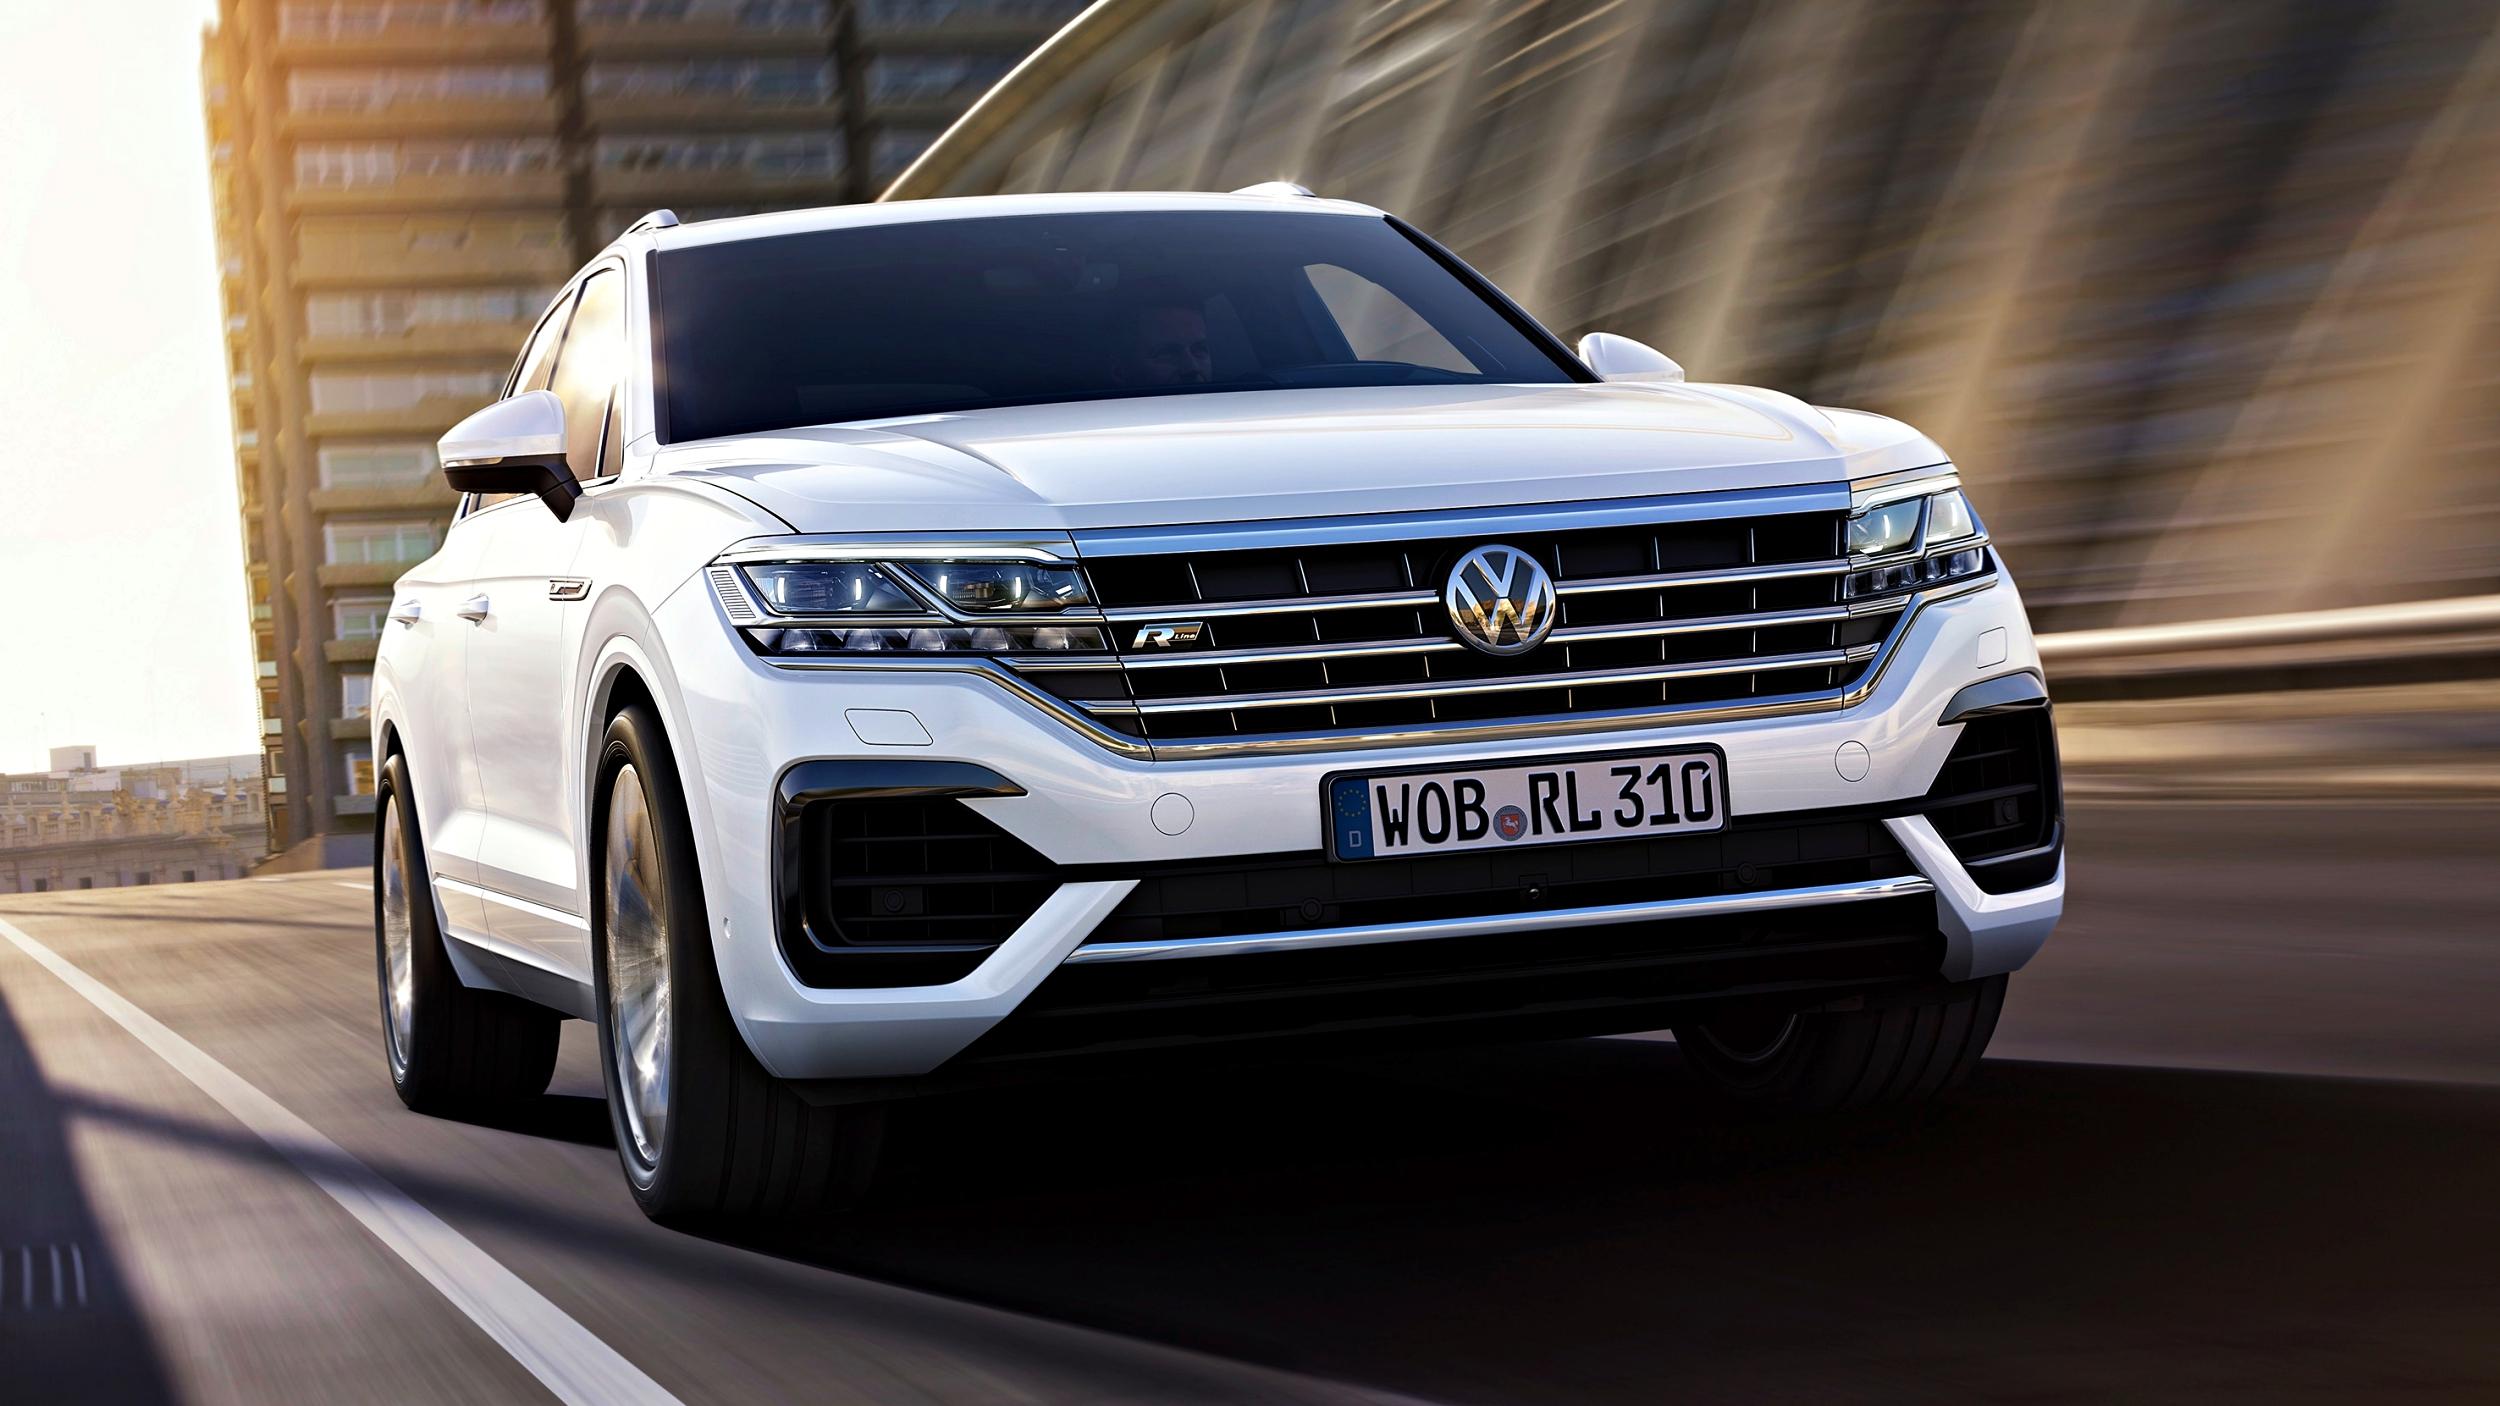 News - Volkswagen Debuts New Touareg 4e15444bd2